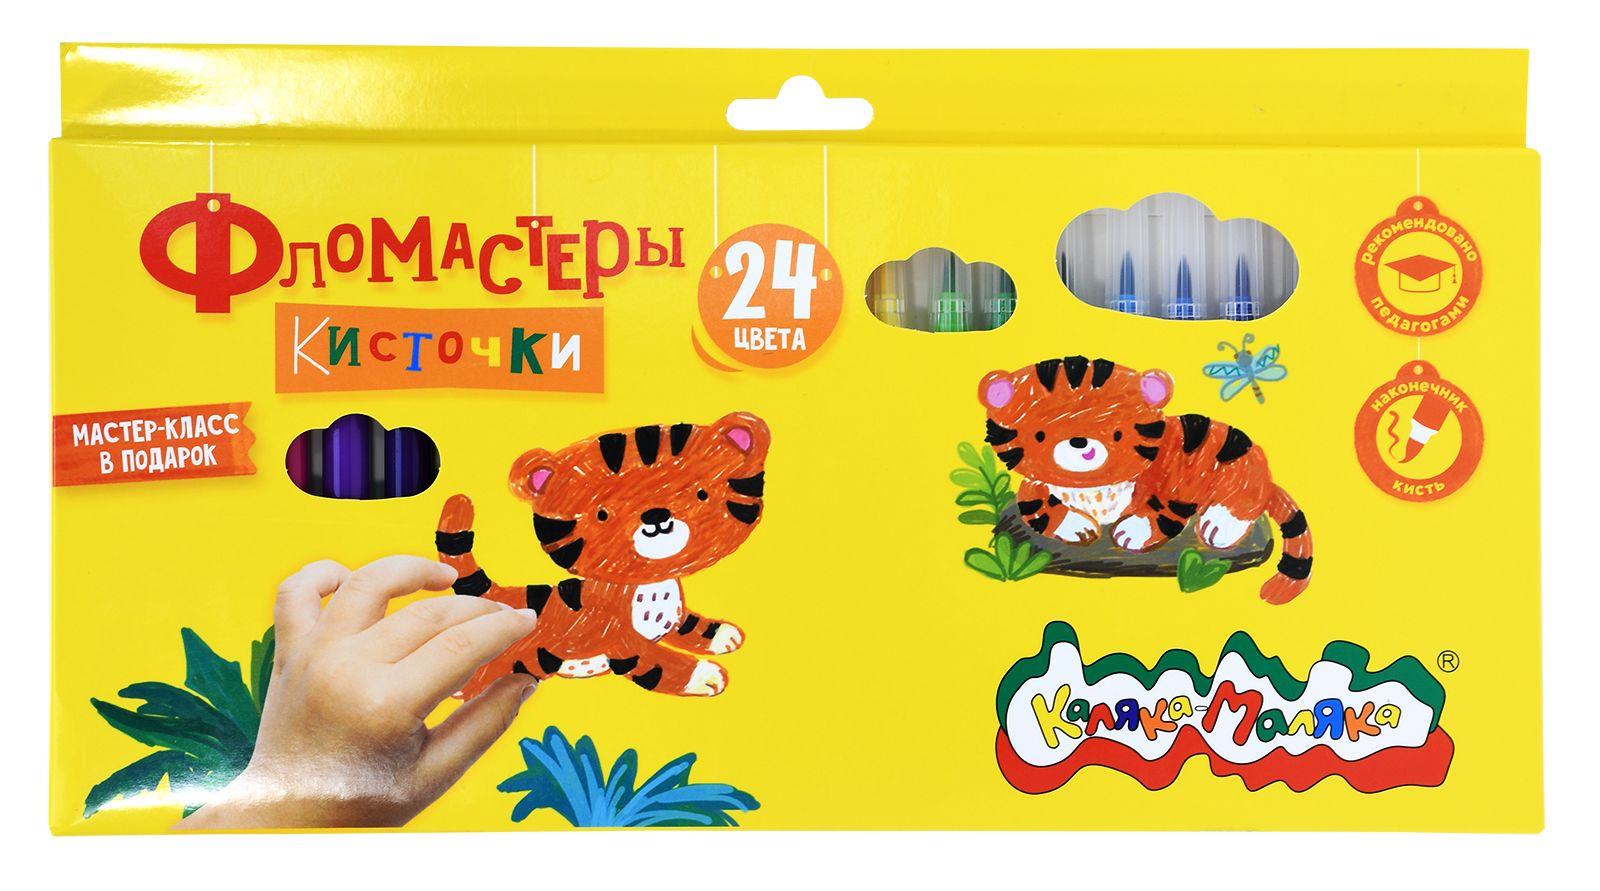 Фломастеры-кисточки Каляка-Маляка 24 цвета, картонная упаковка, круглый корпус, 3+